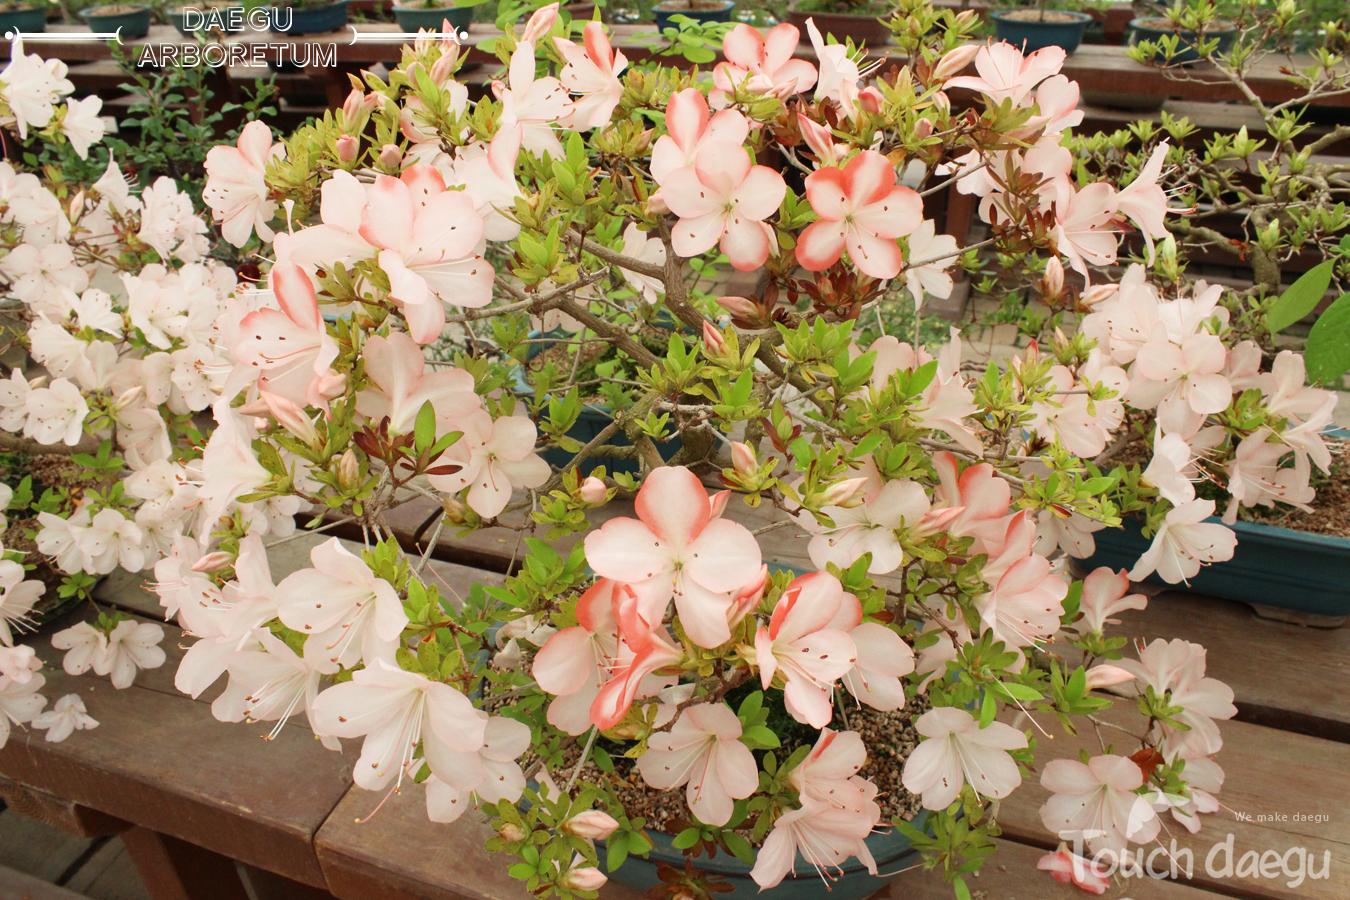 Adorable flowers in the green house of Daegu Arboretum